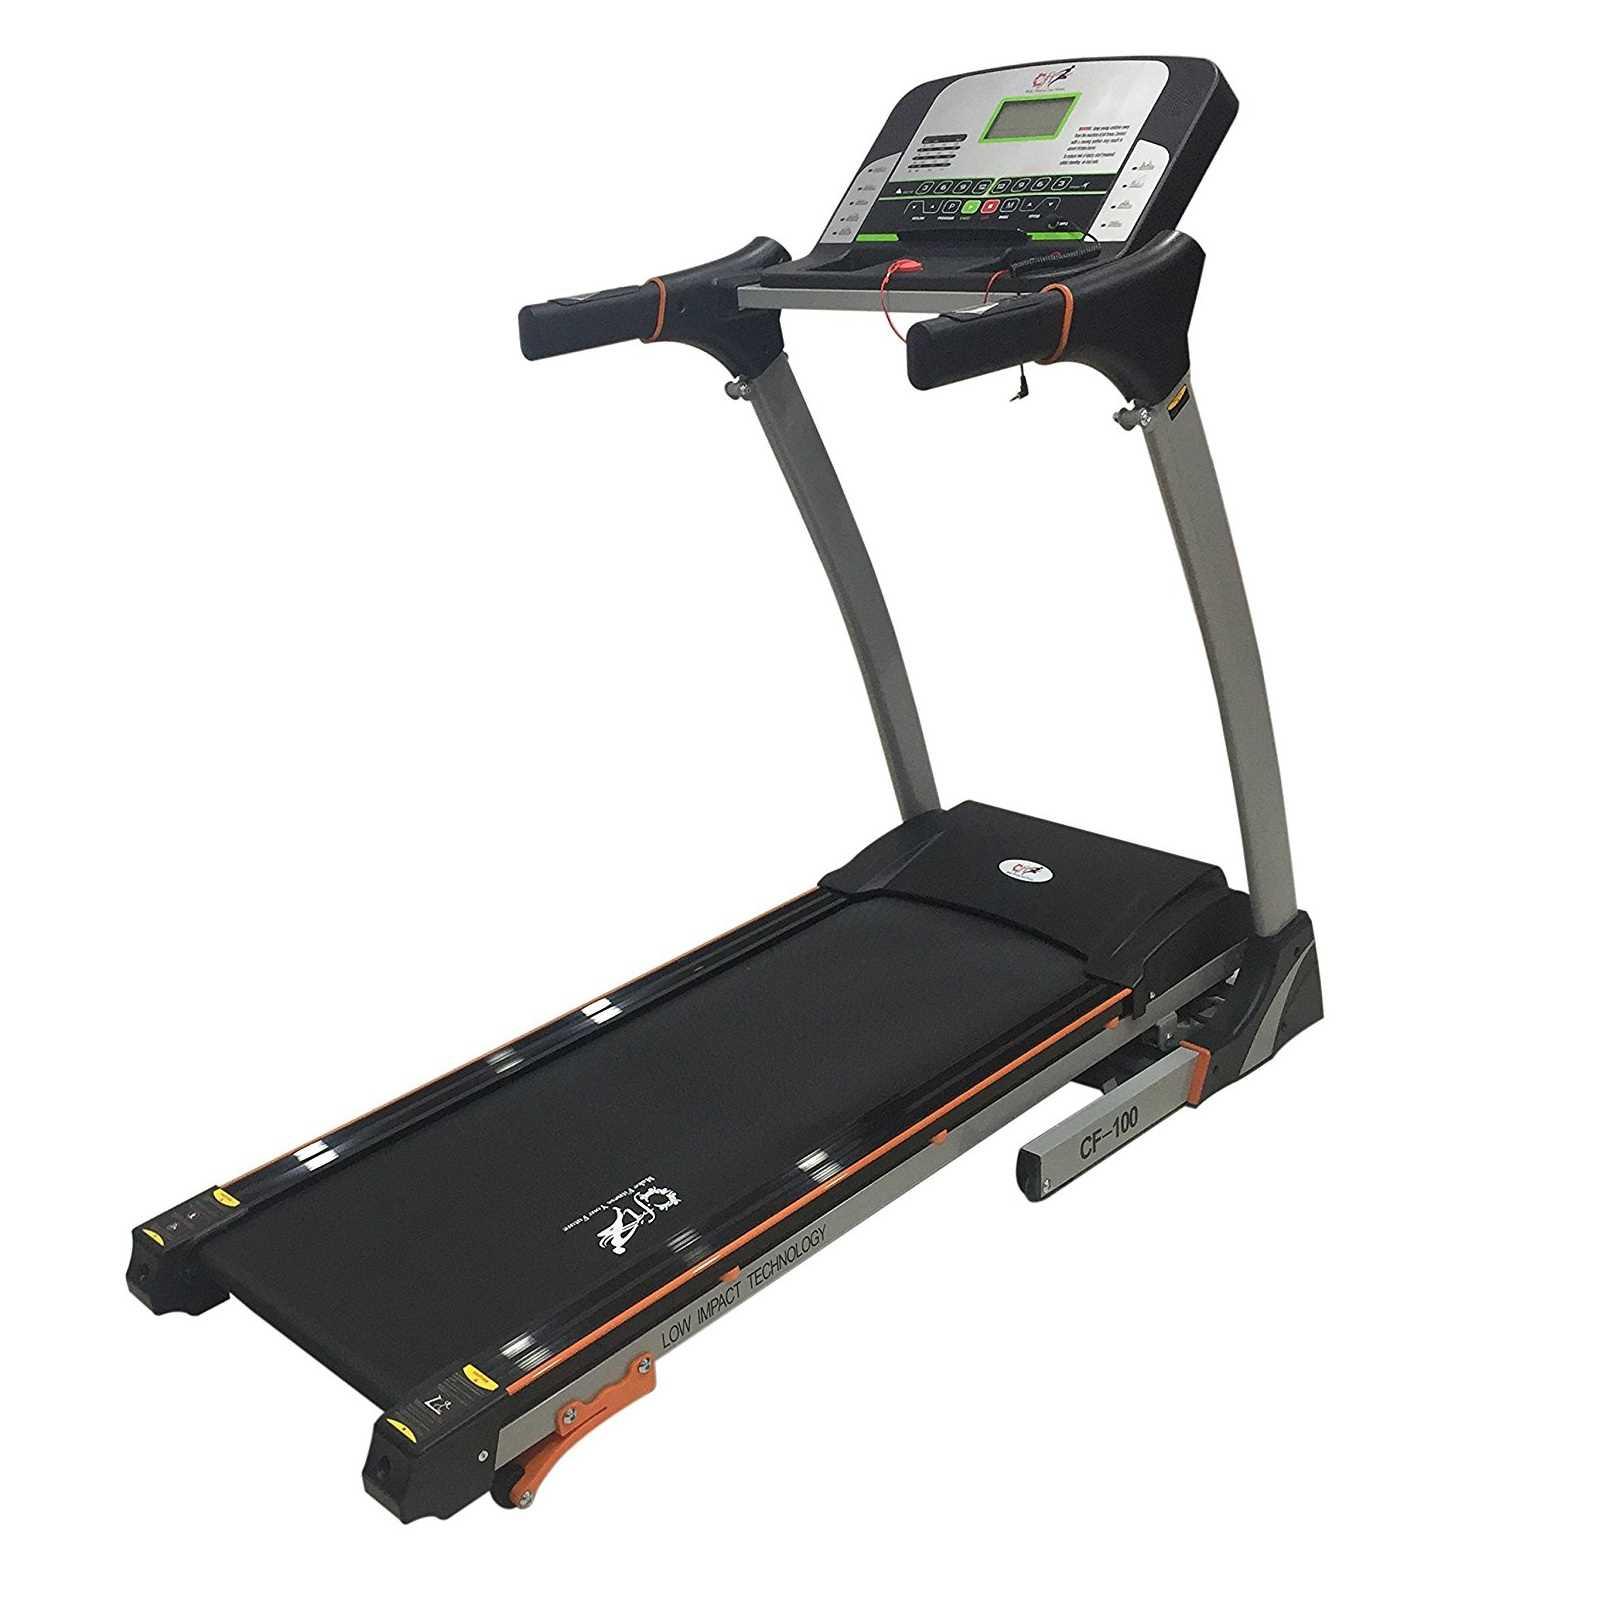 CFIT CF-100 Motorized Treadmill